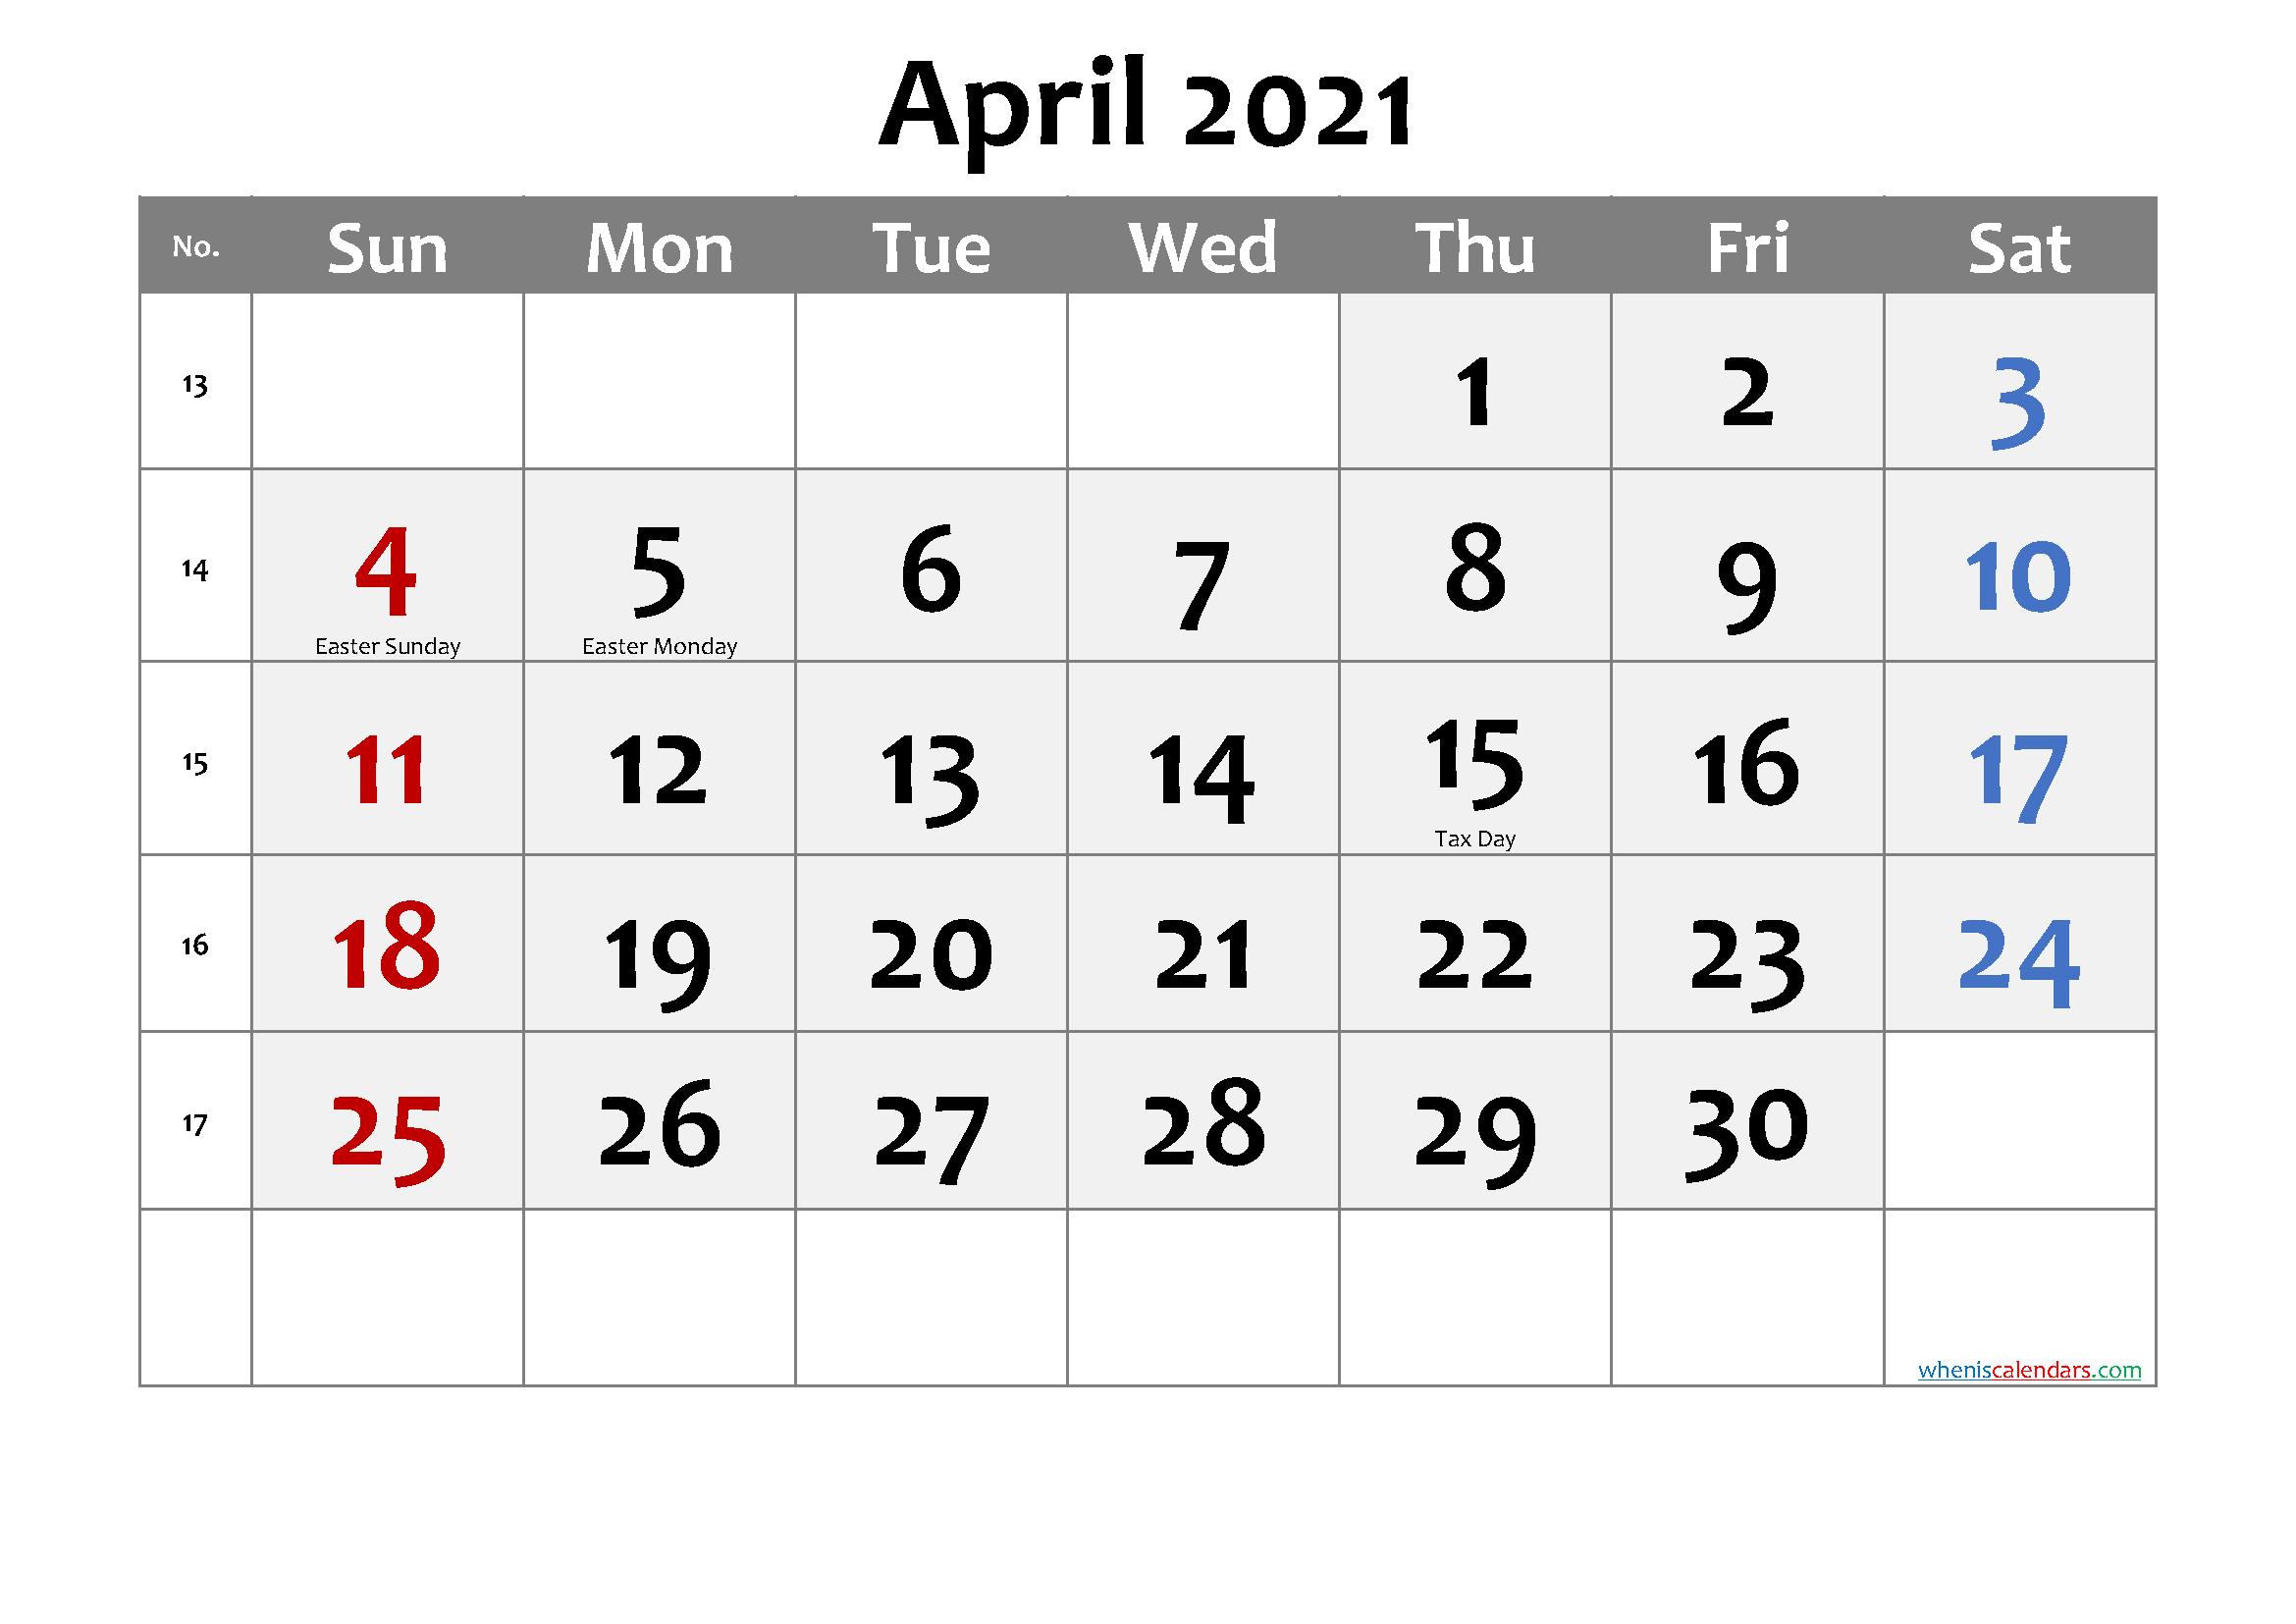 Holidays Calendar April 2021